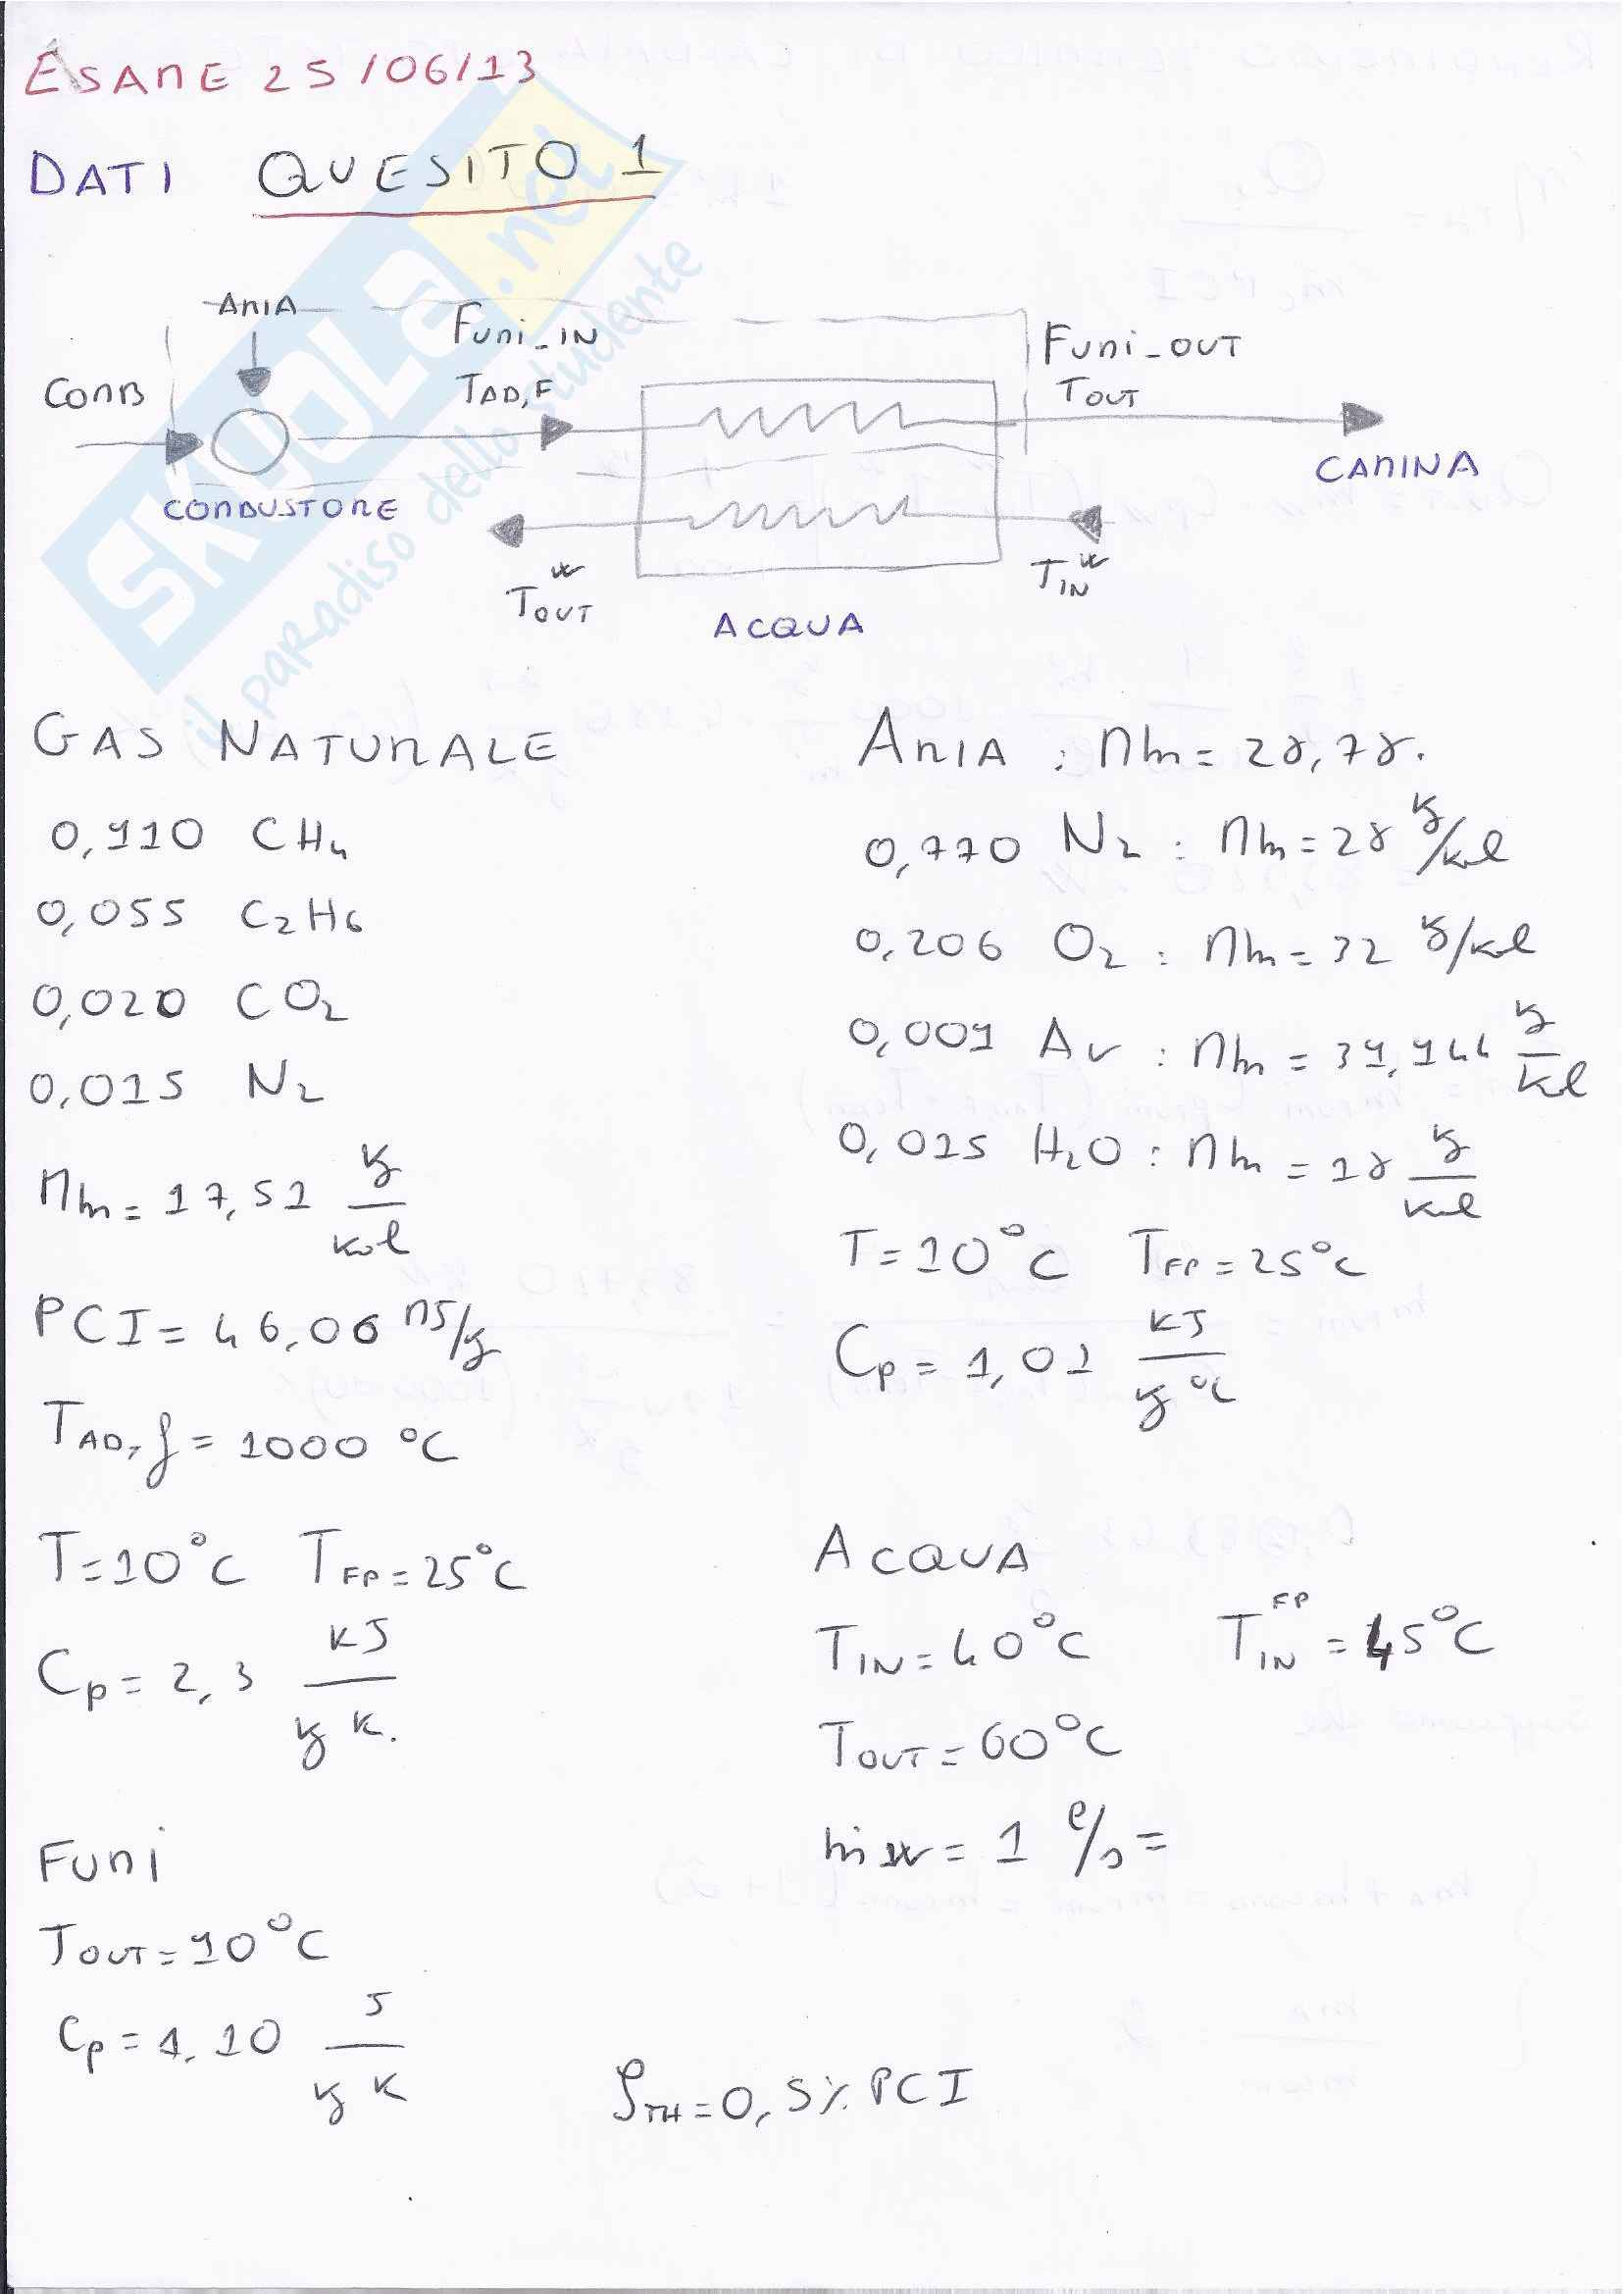 Sistemi Energetici - esame svolto 2013